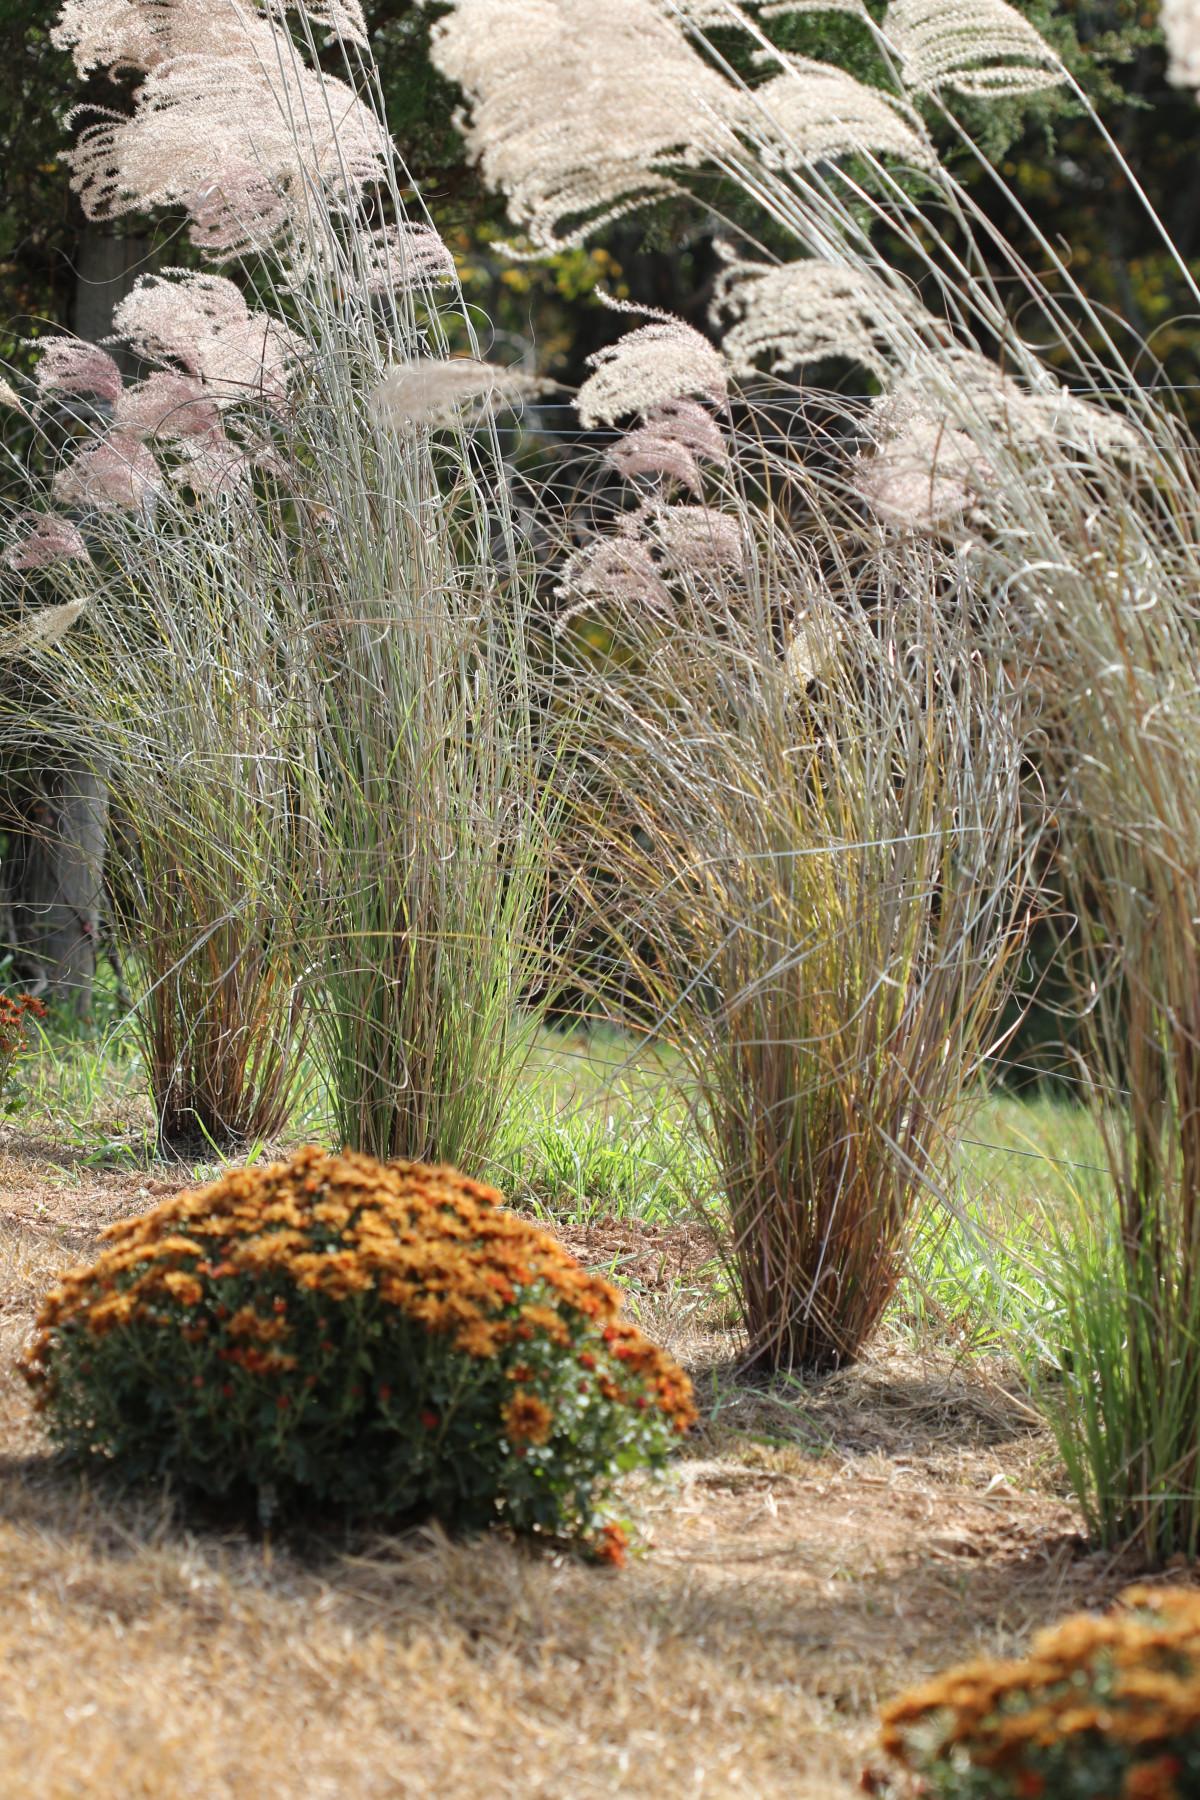 kostenlose foto landschaft baum gras draussen pflanze rasen fallen blume bl hen. Black Bedroom Furniture Sets. Home Design Ideas